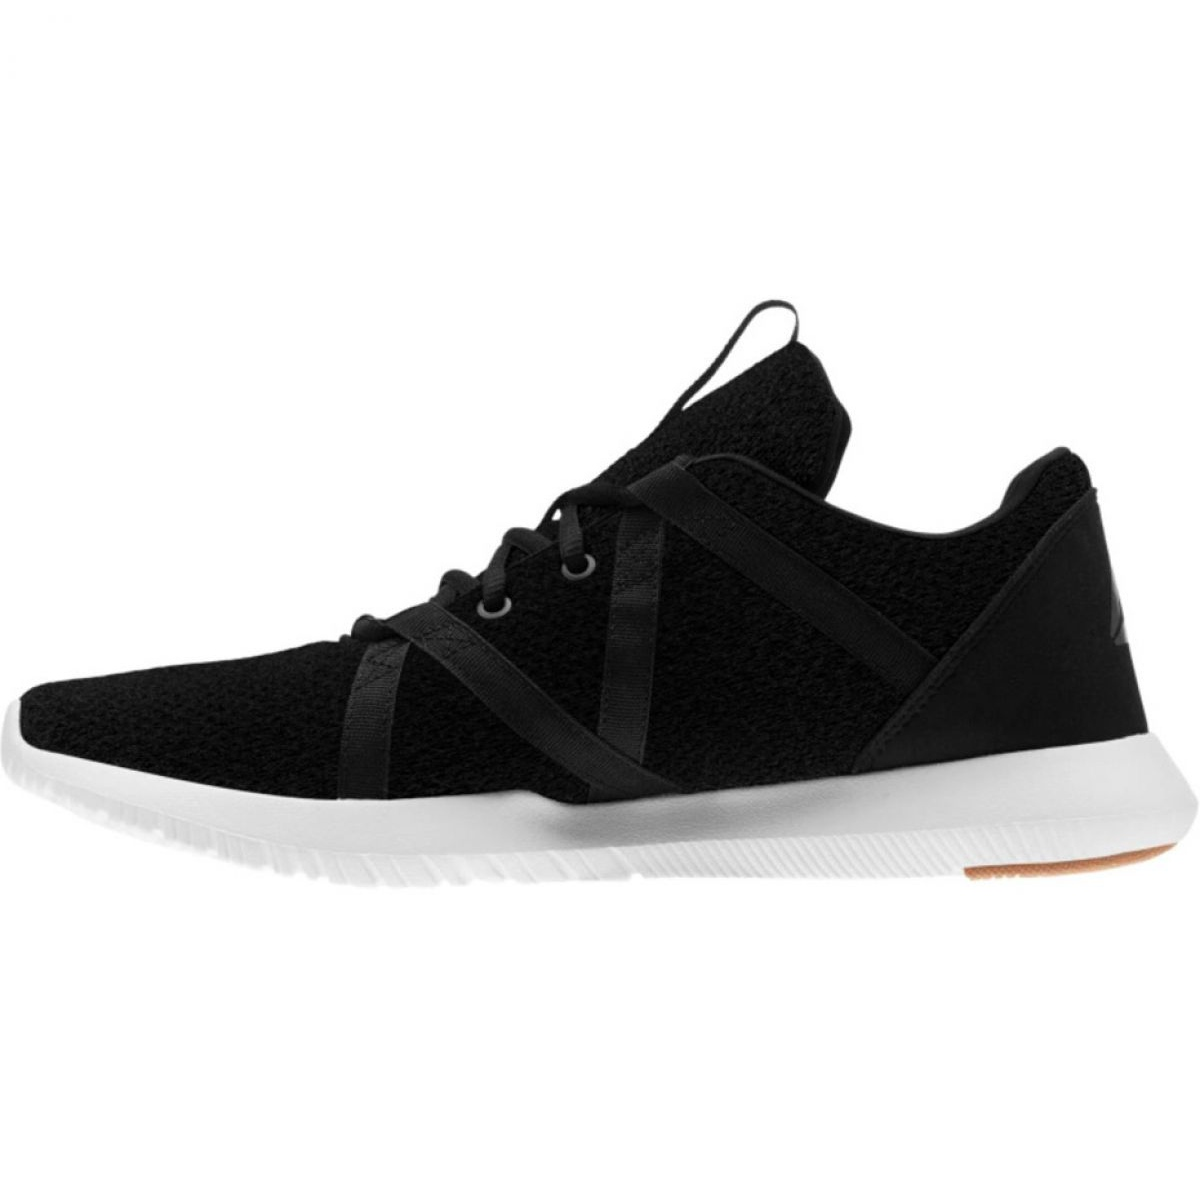 Chaussures-Reebok-Reago-Essential-M-CN4624-noir miniature 2